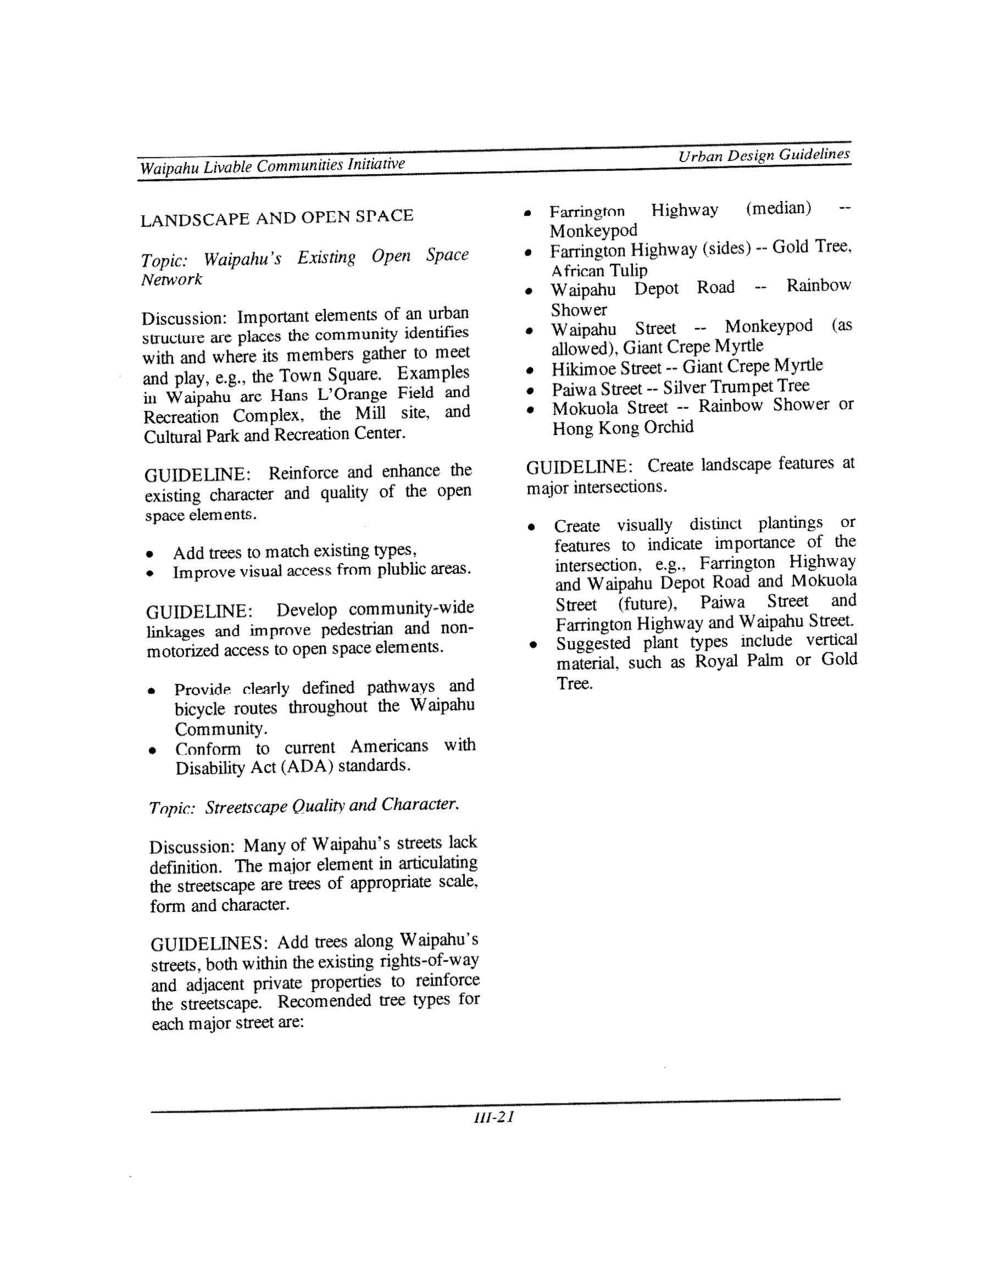 160531_WaipahuLivableCommunities(1998)_Page_111.jpg